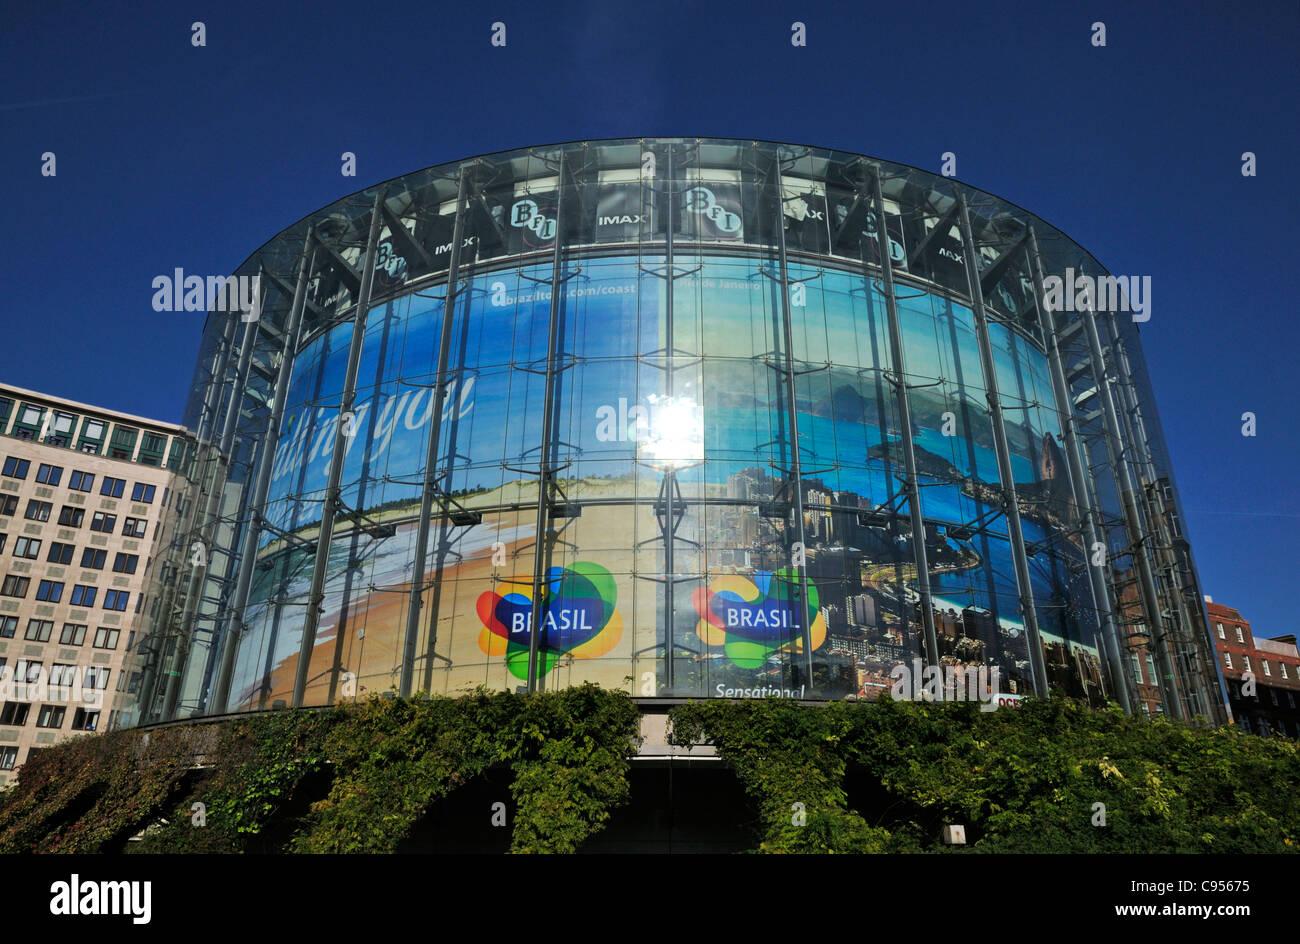 BFI IMAX, South Bank, Waterloo, London SE1, United Kingdom - Stock Image